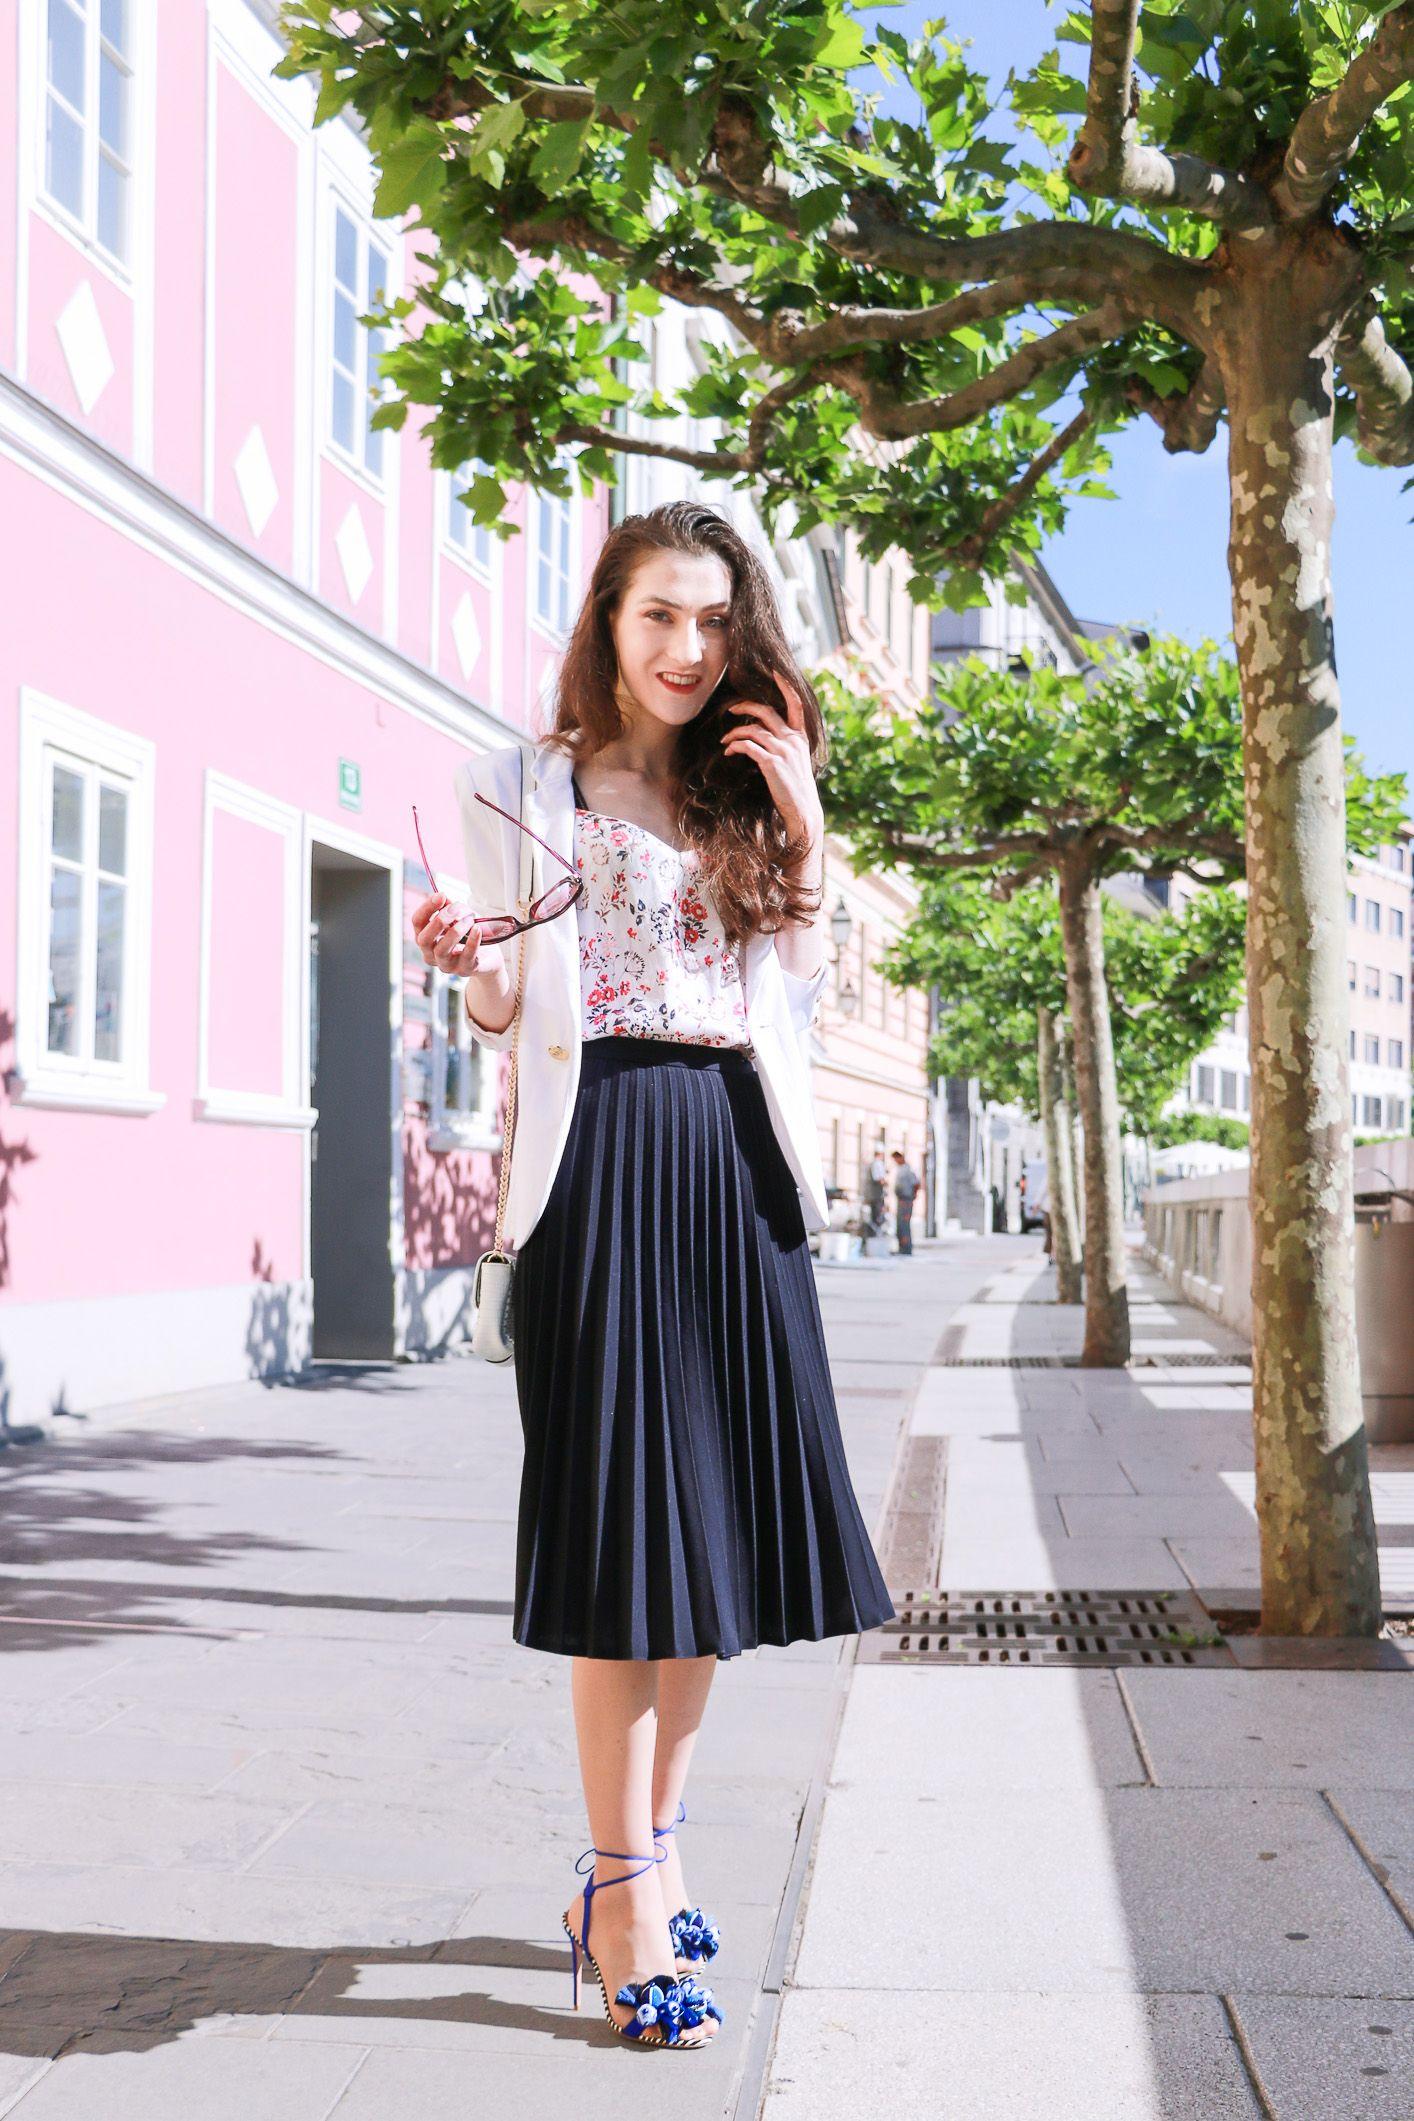 645bd4617a Fashion blogger Veronika Lipar of Brunette From Wall Street sharing how to  wear black vintage midi pleated skirt, blue Tropicana tasseled beaded  sandals ...